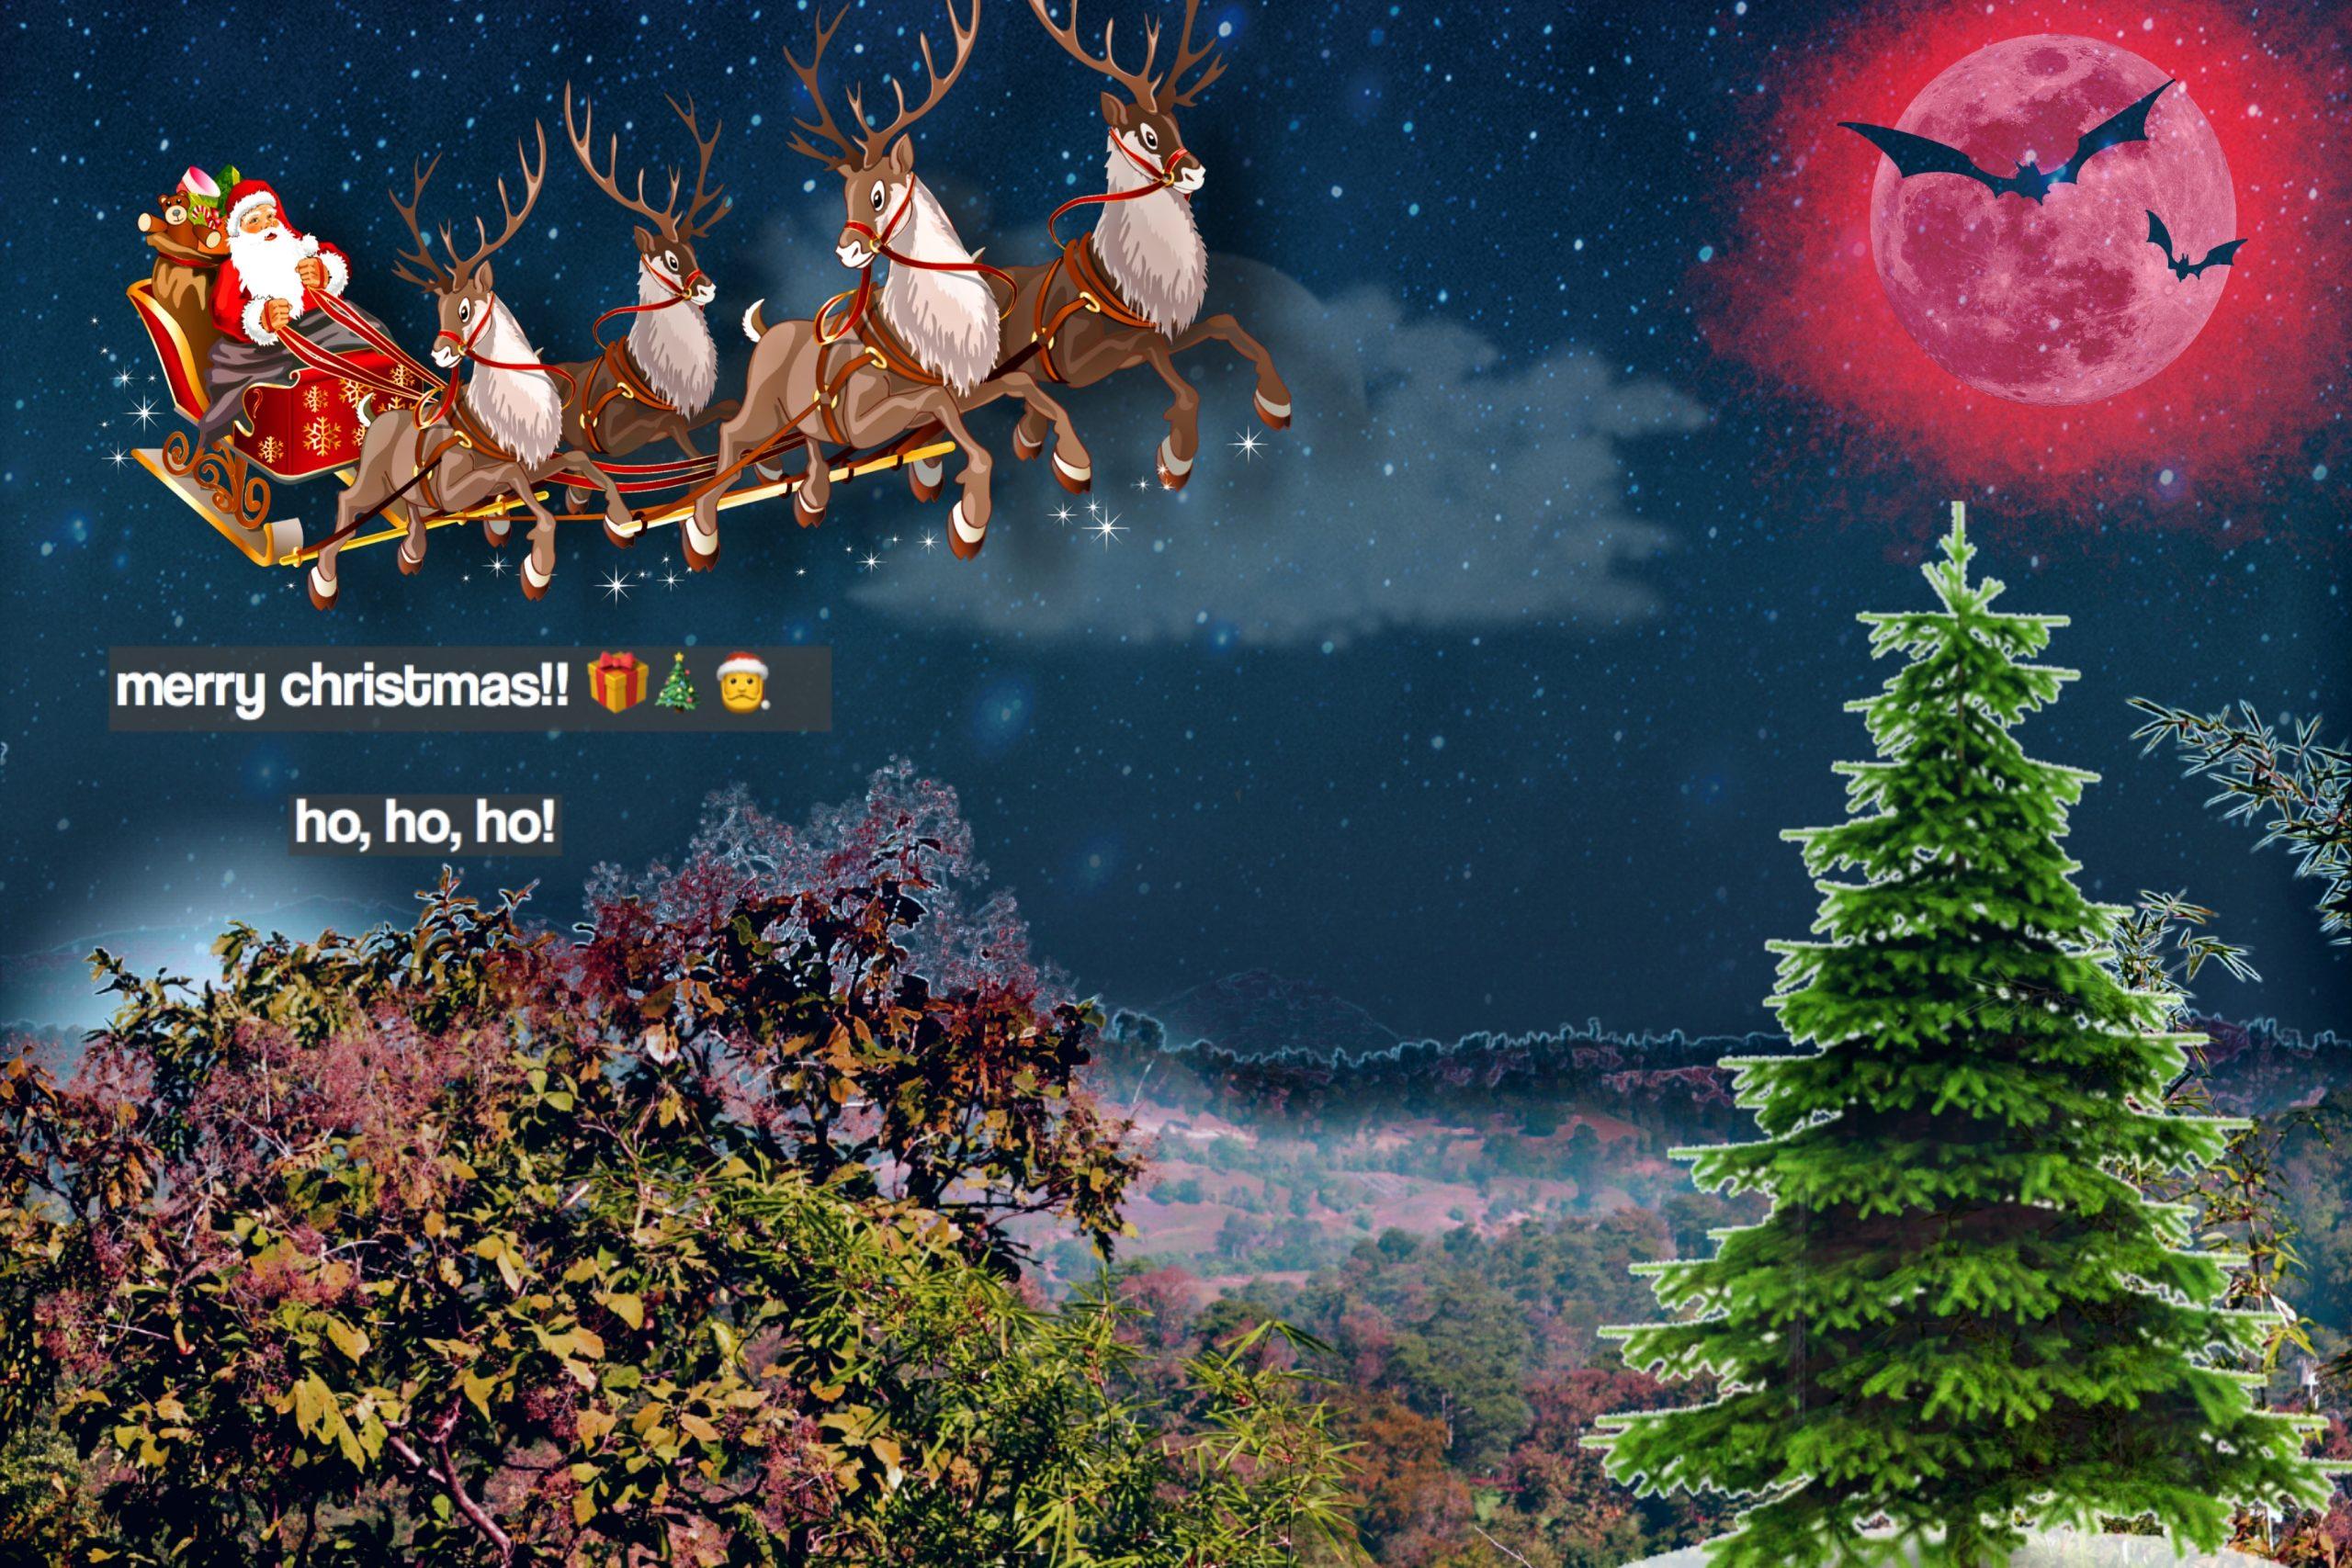 Marry Christmas greetings card